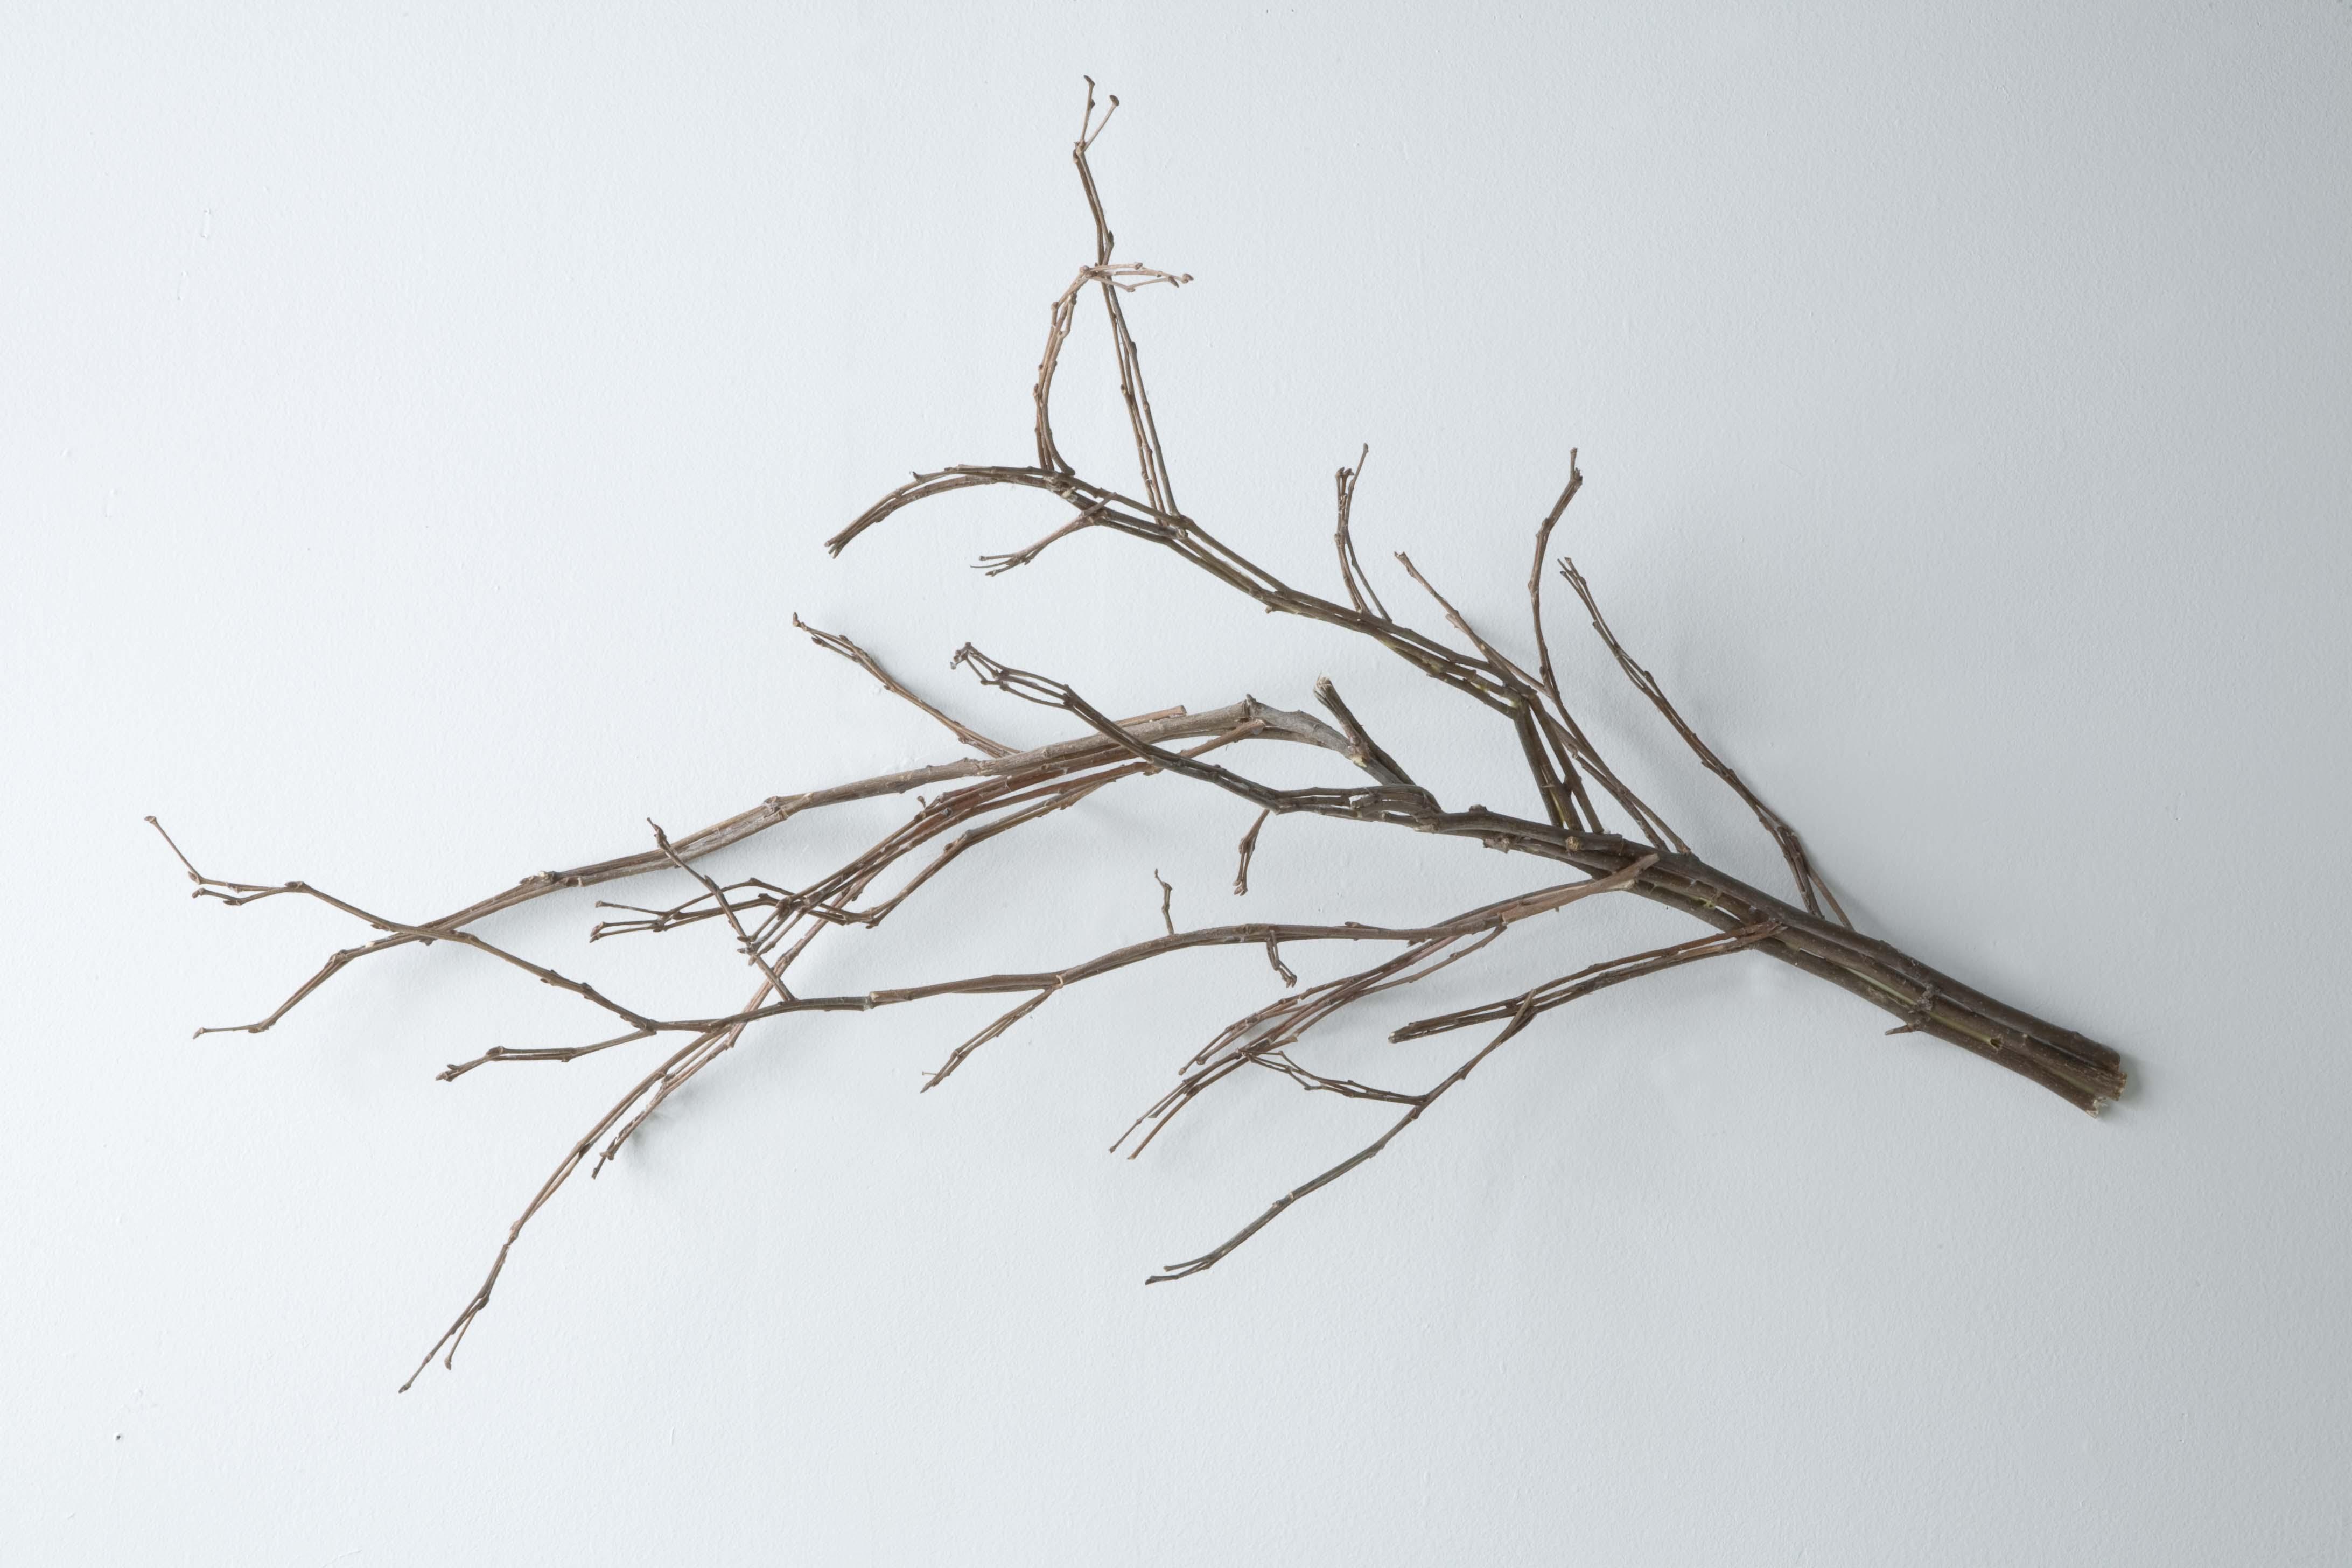 Jonathan Plante, Treesome, 2008, bois, wood,19.5